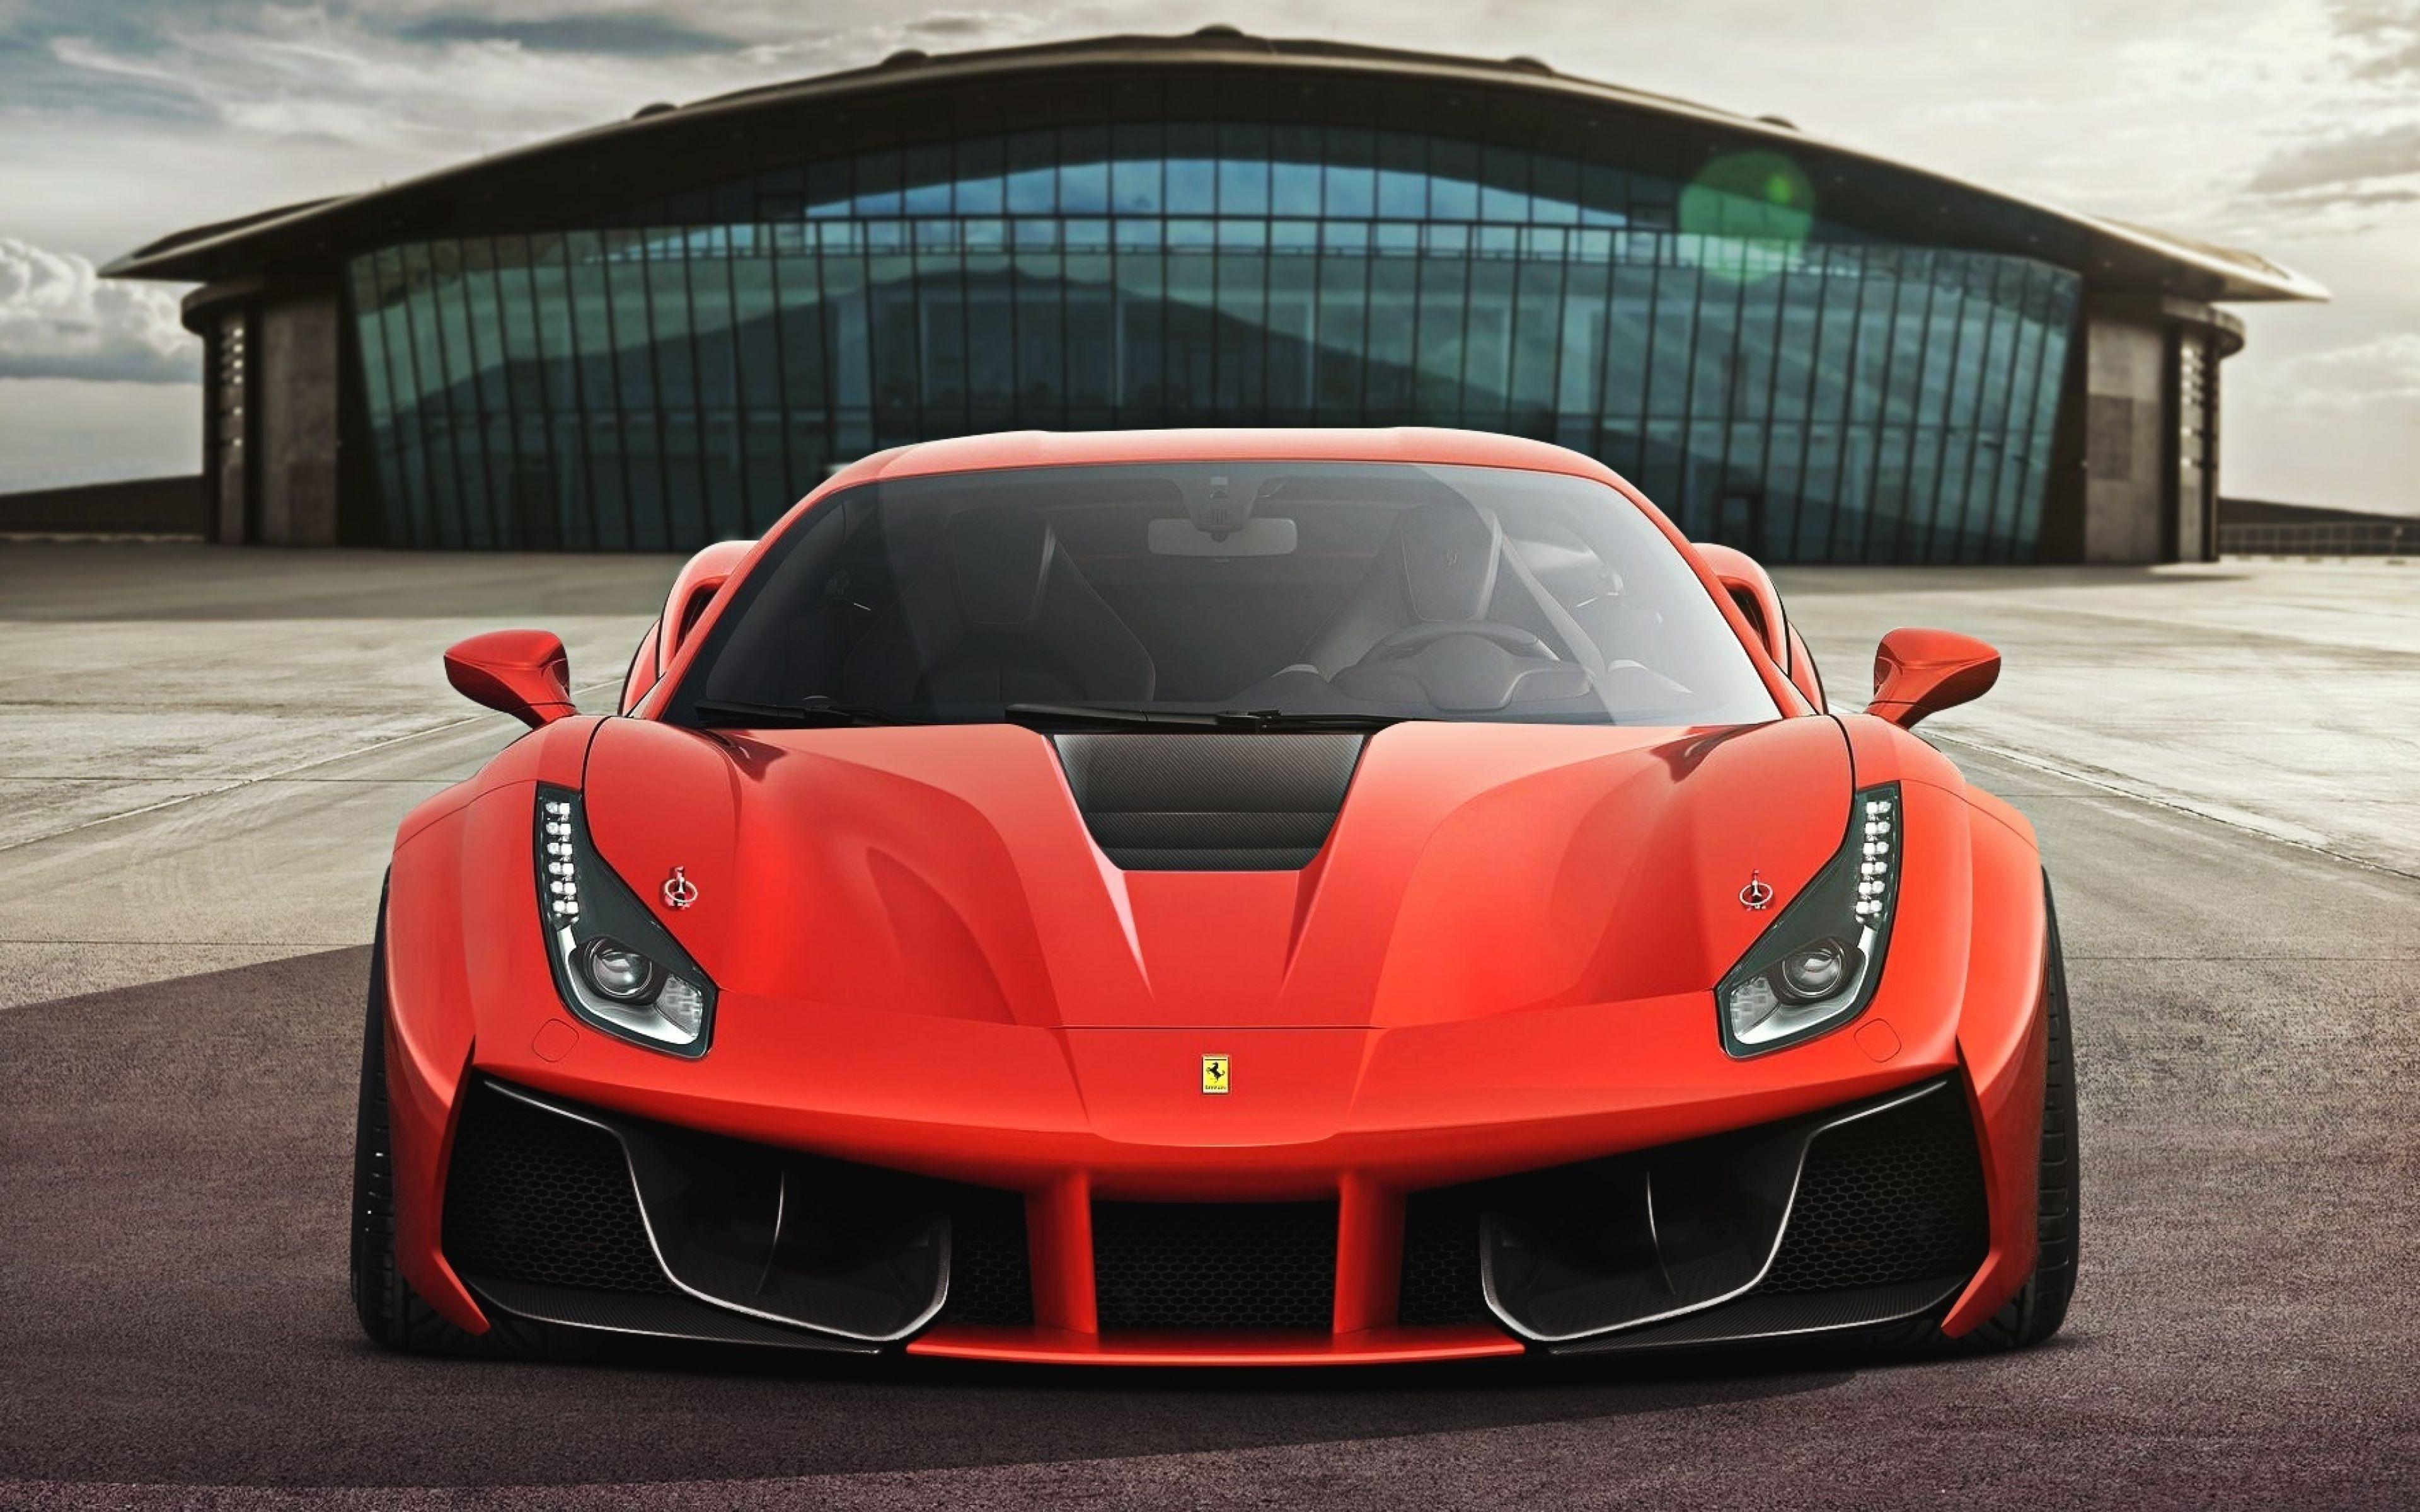 car wallpaper - 100+ EPIC Best Wallpaper Carros 4k   MioDl ...